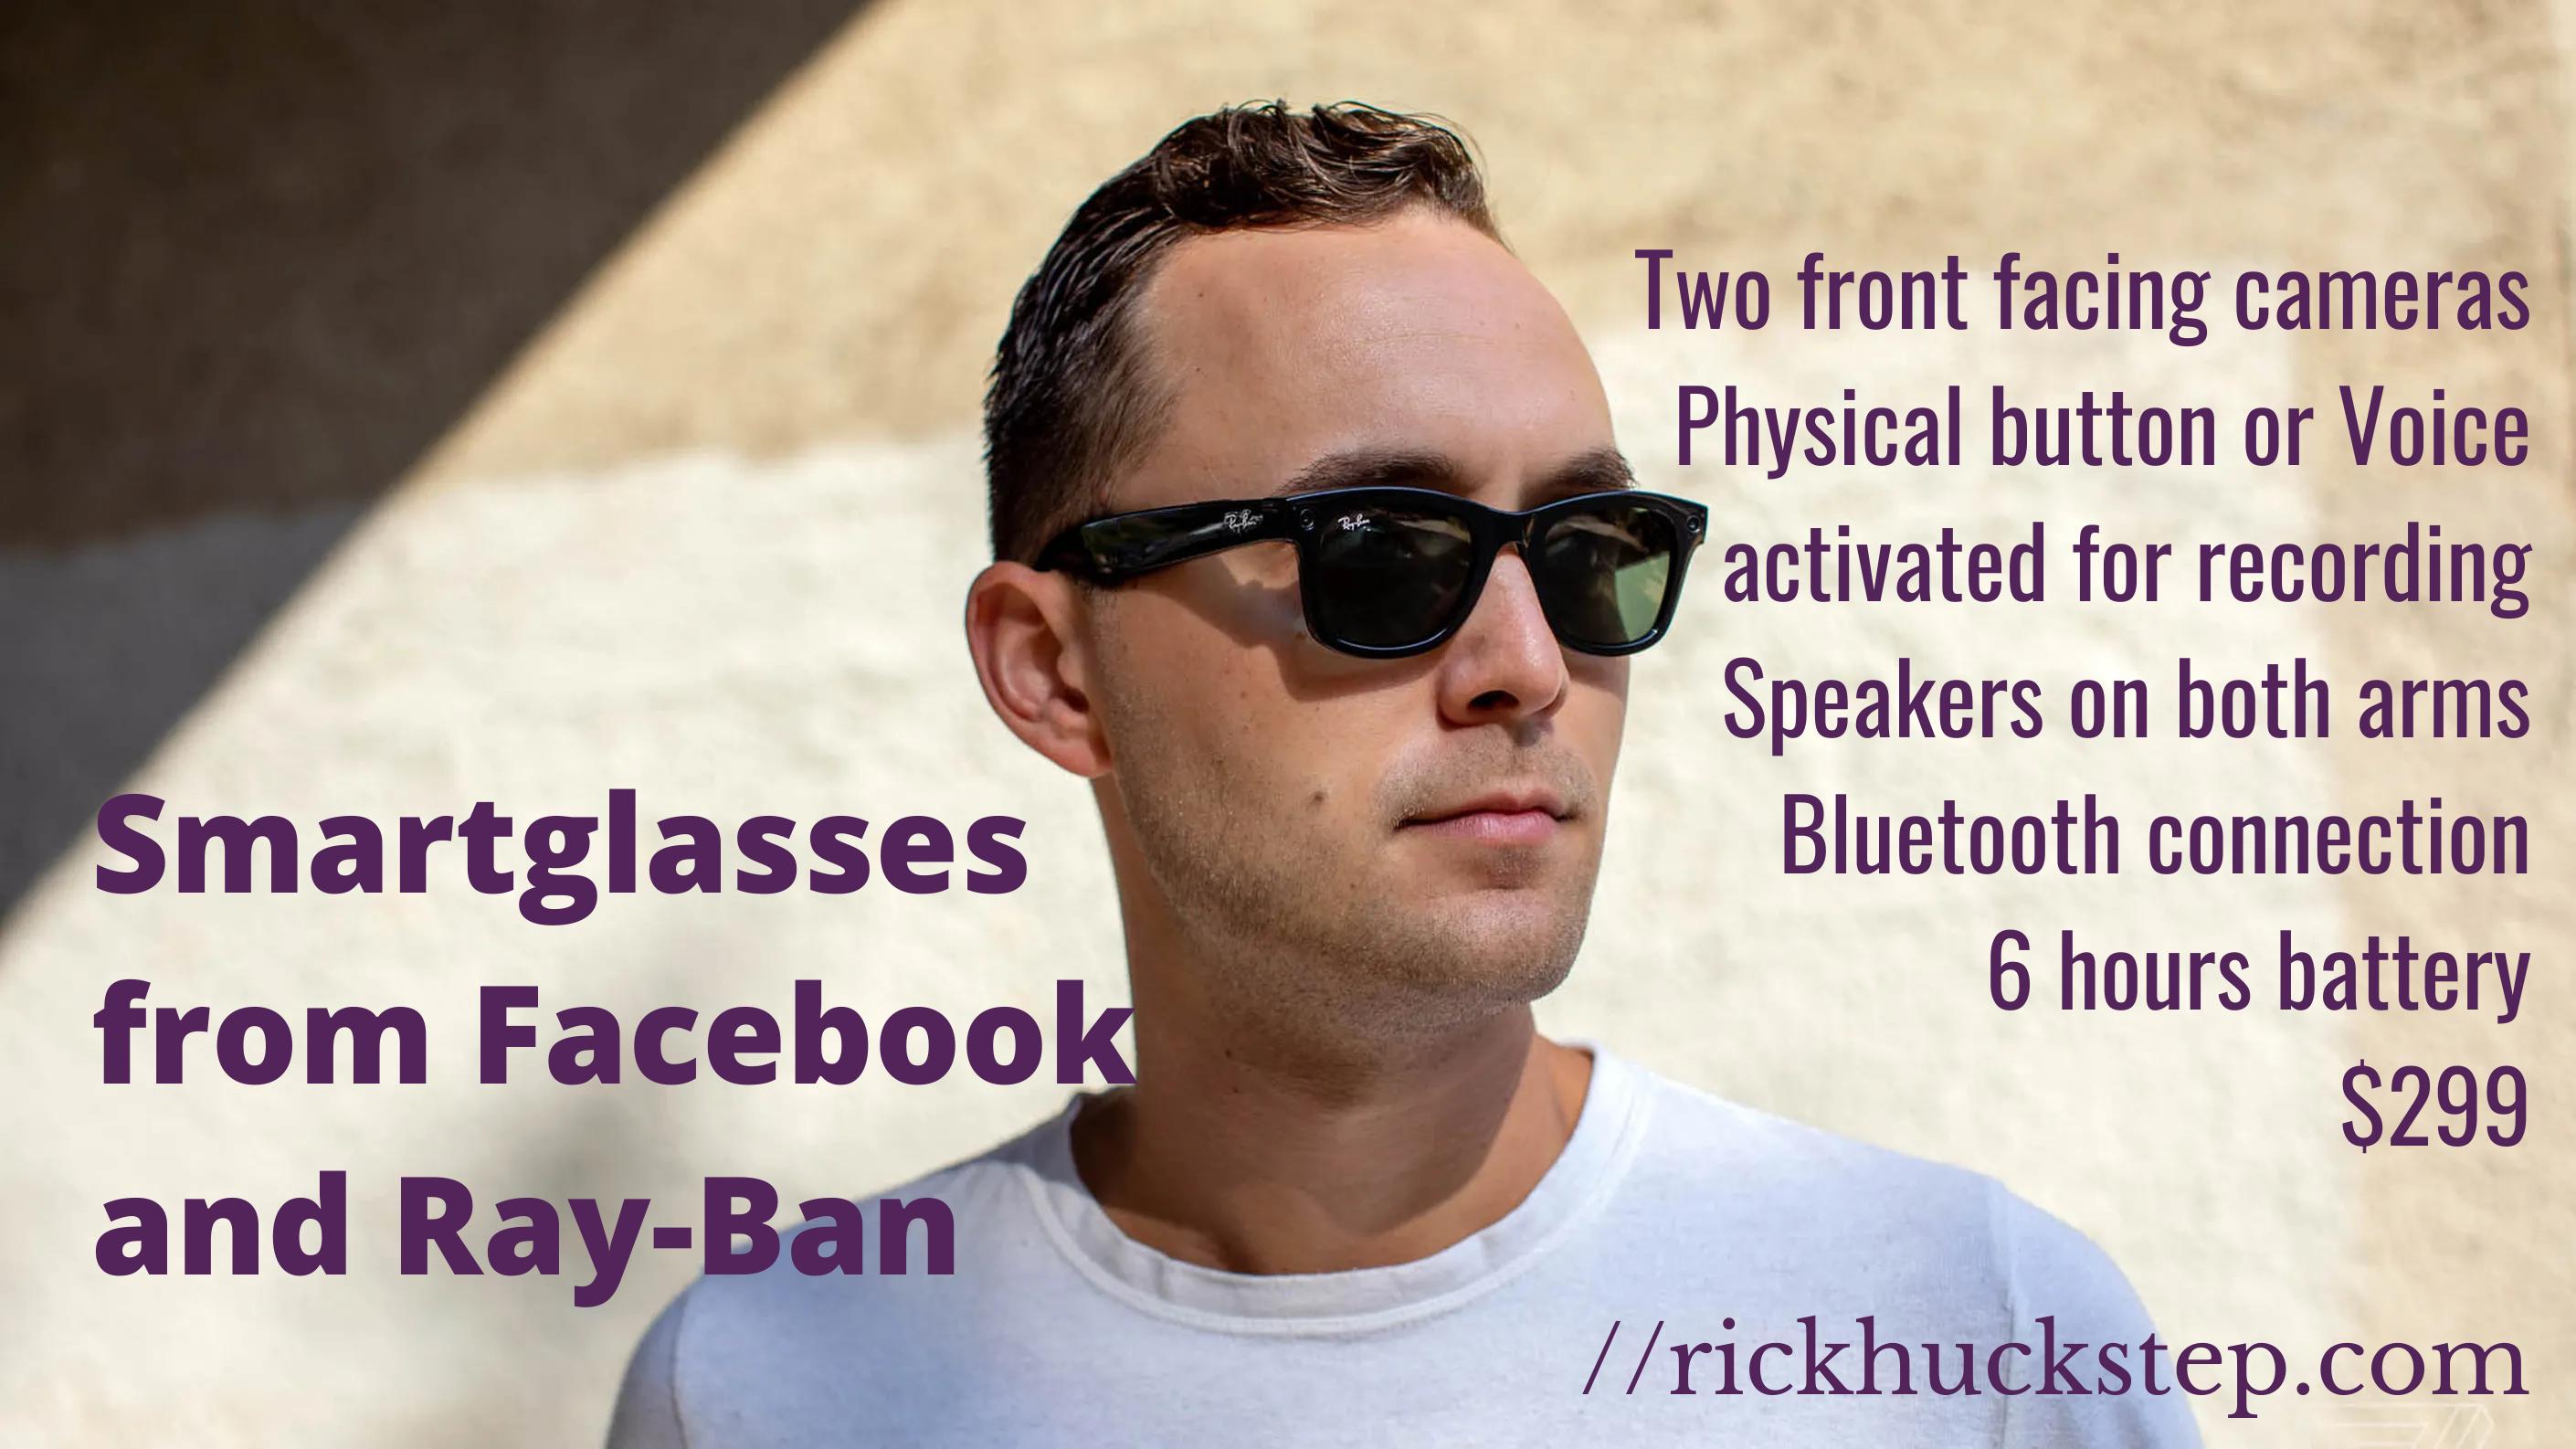 facebook-rick-huckstep-wiser-newsletter-wisernewsletter